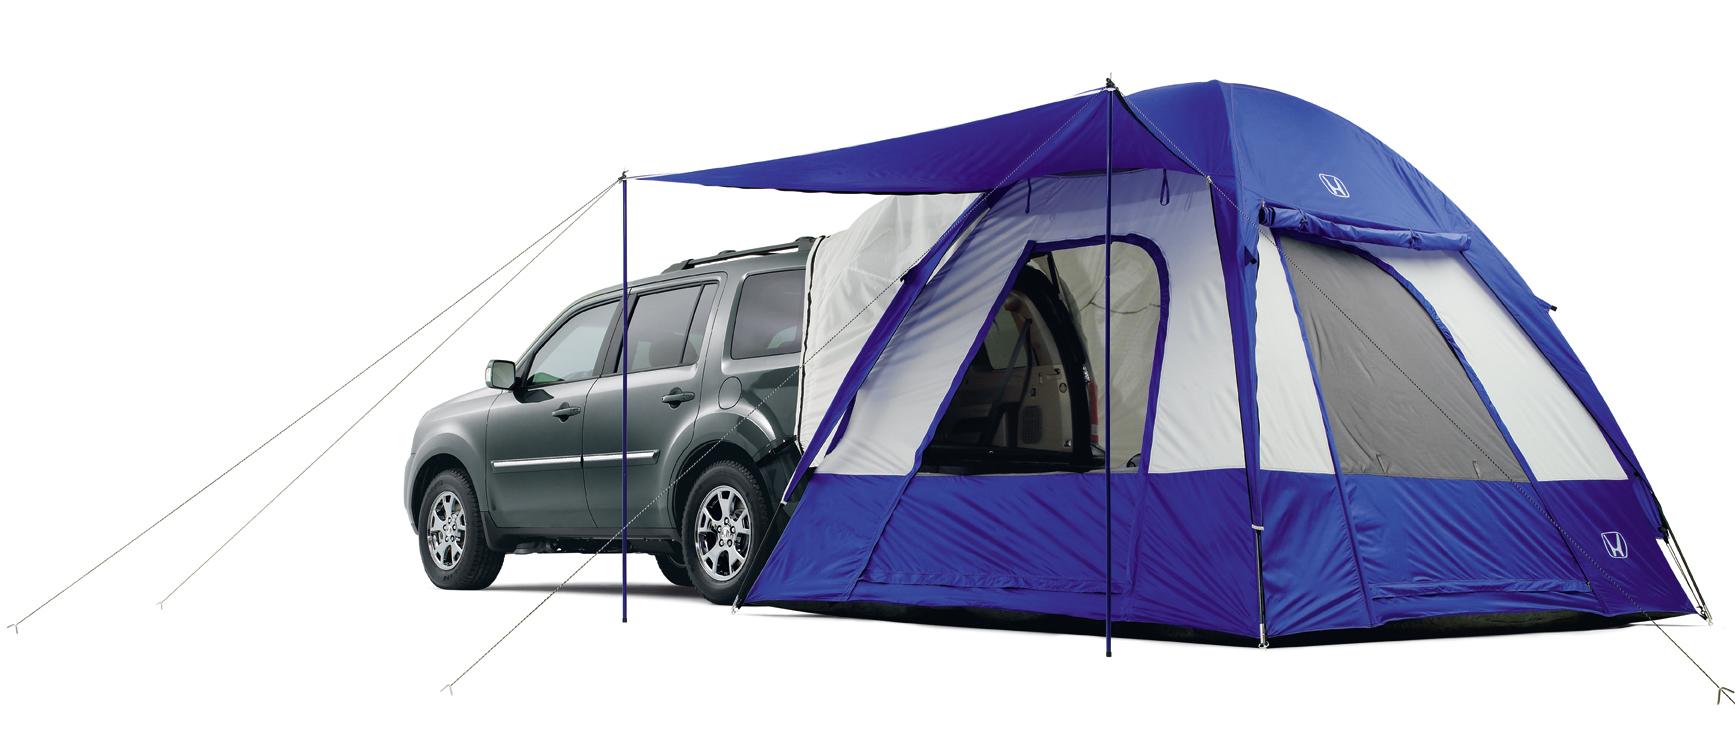 Tent Pilot 08z04 Scv 100b 281 05